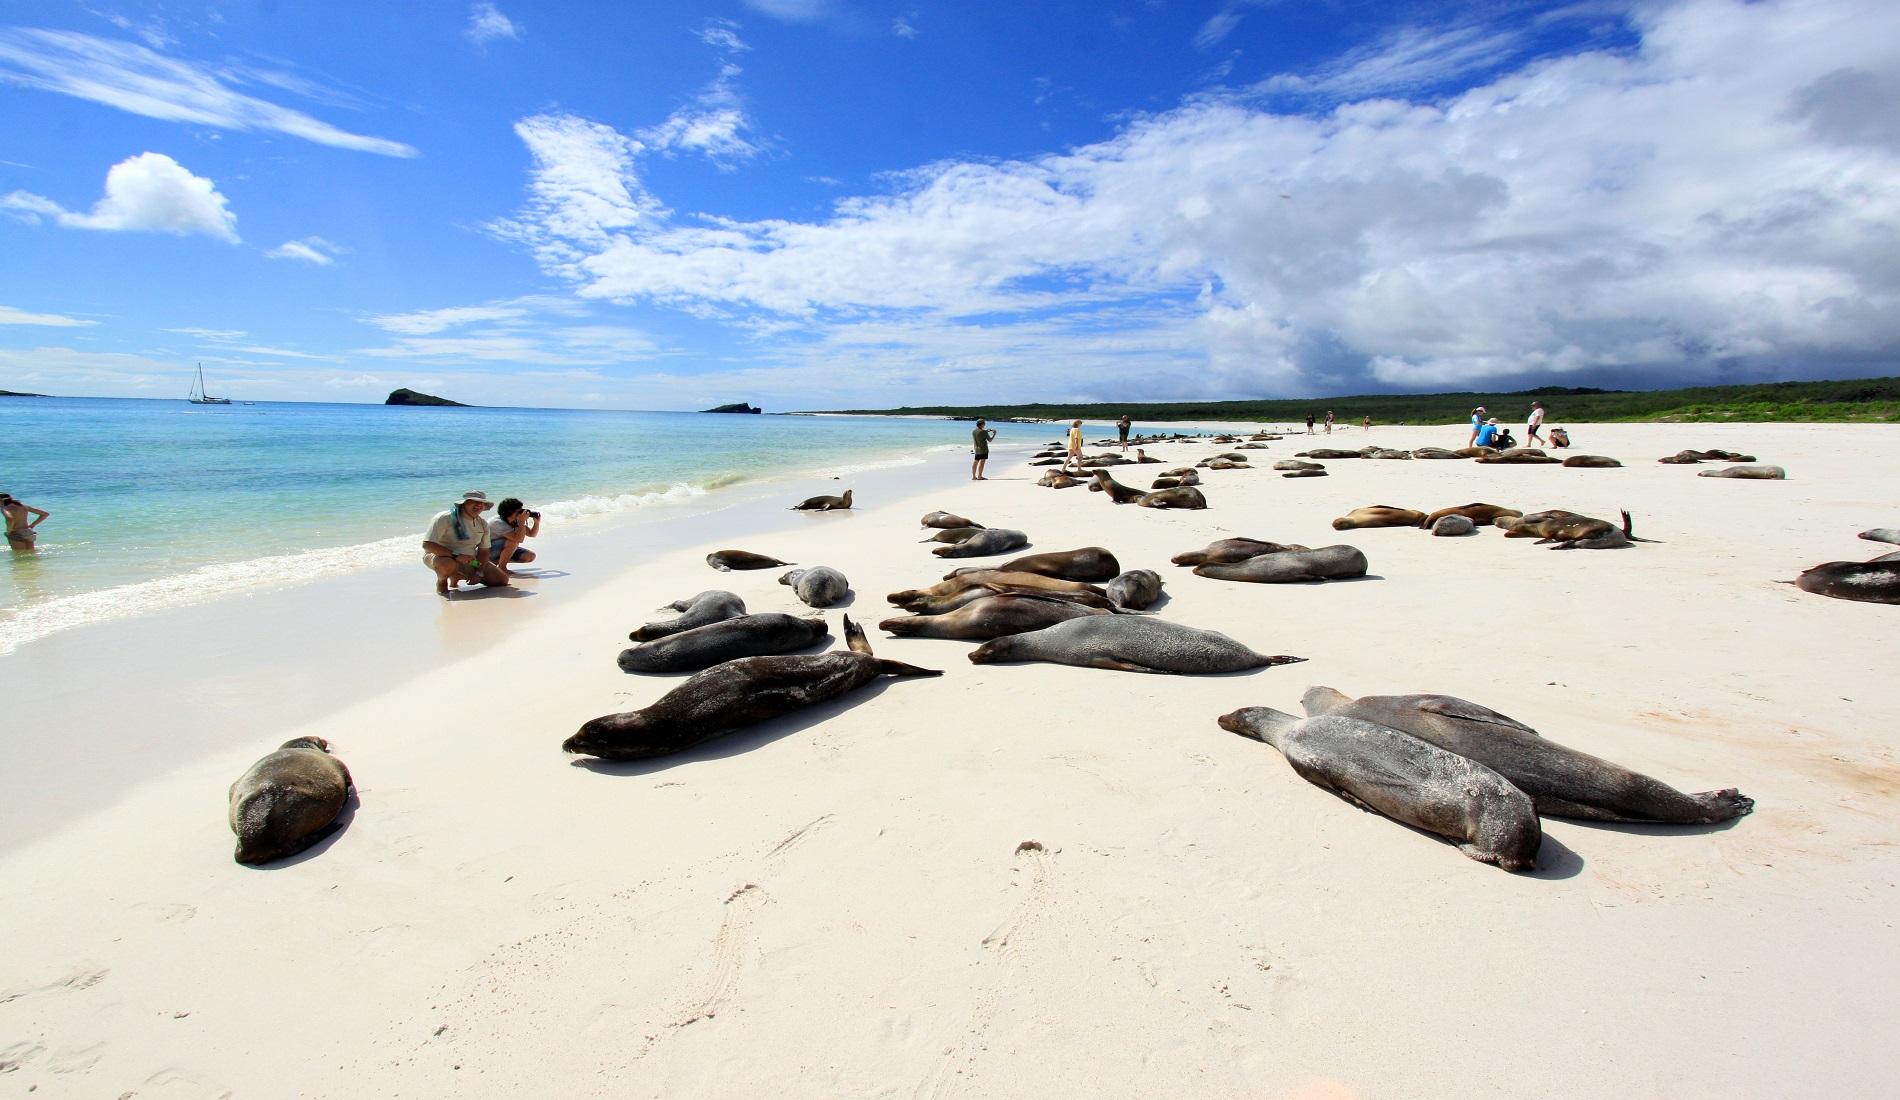 eilandhoppen galapagos eilanden espanola